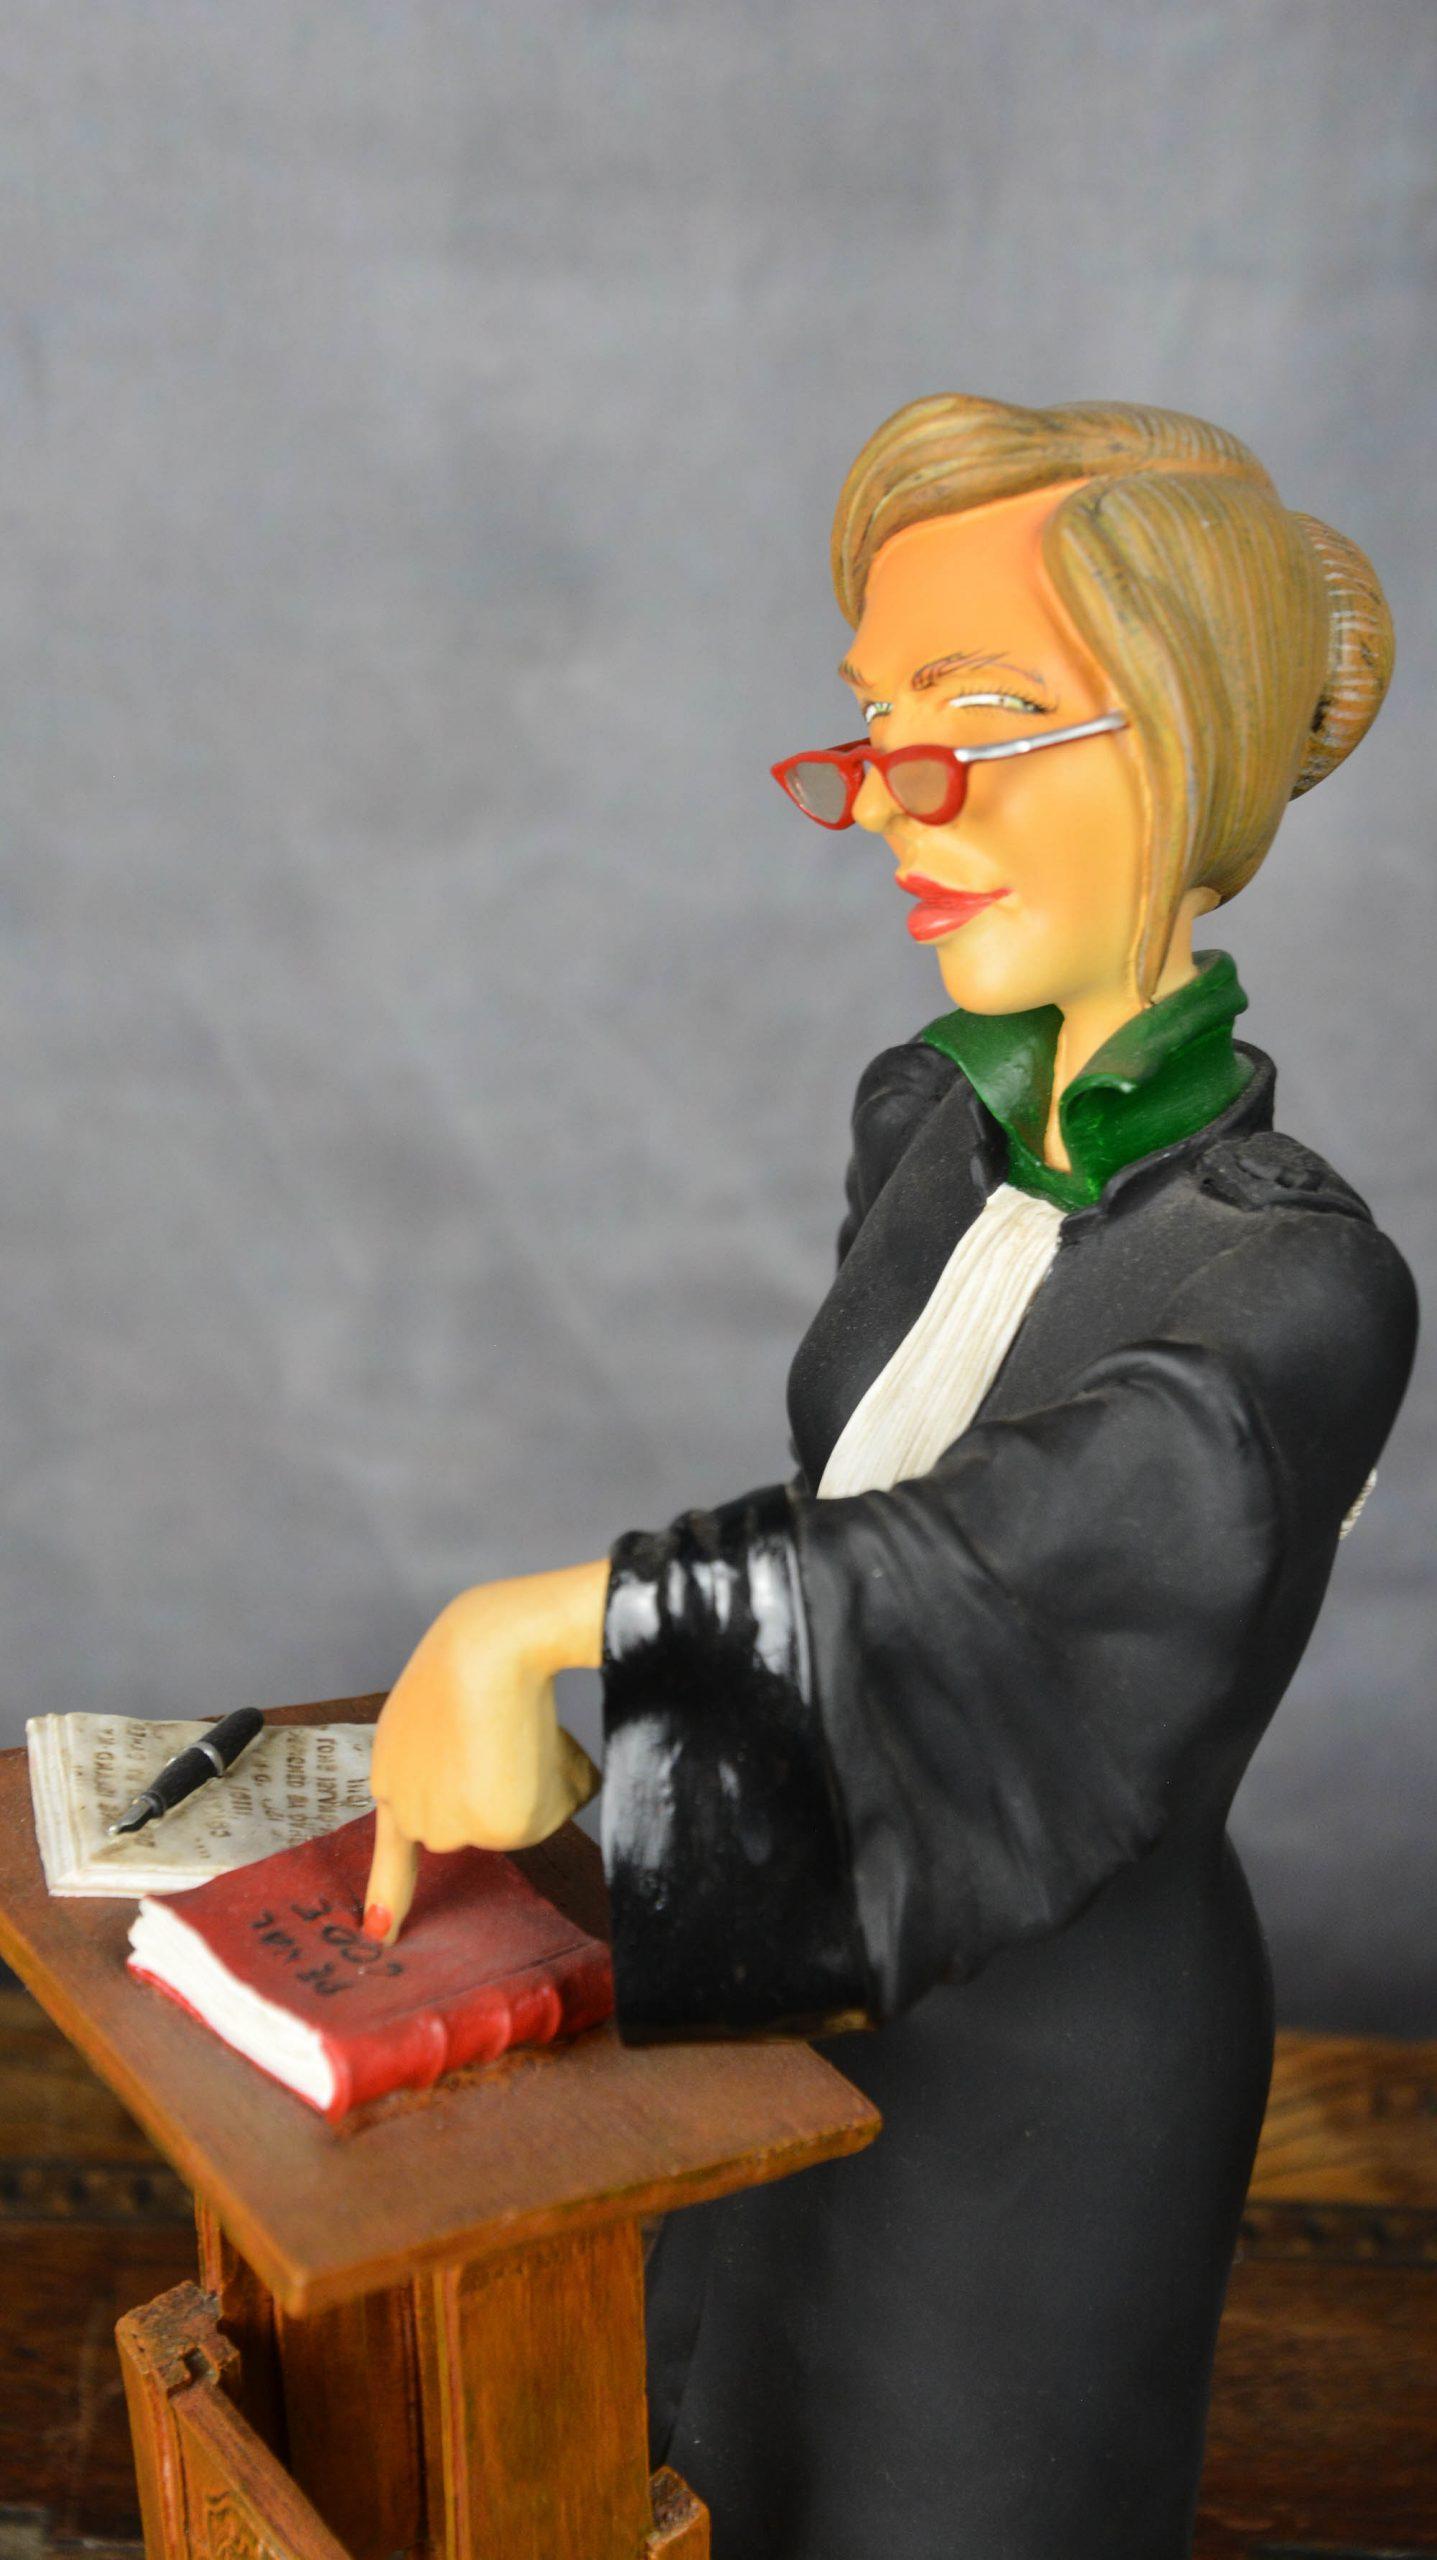 boutique figurine piece artisanale personnage avocate parodie